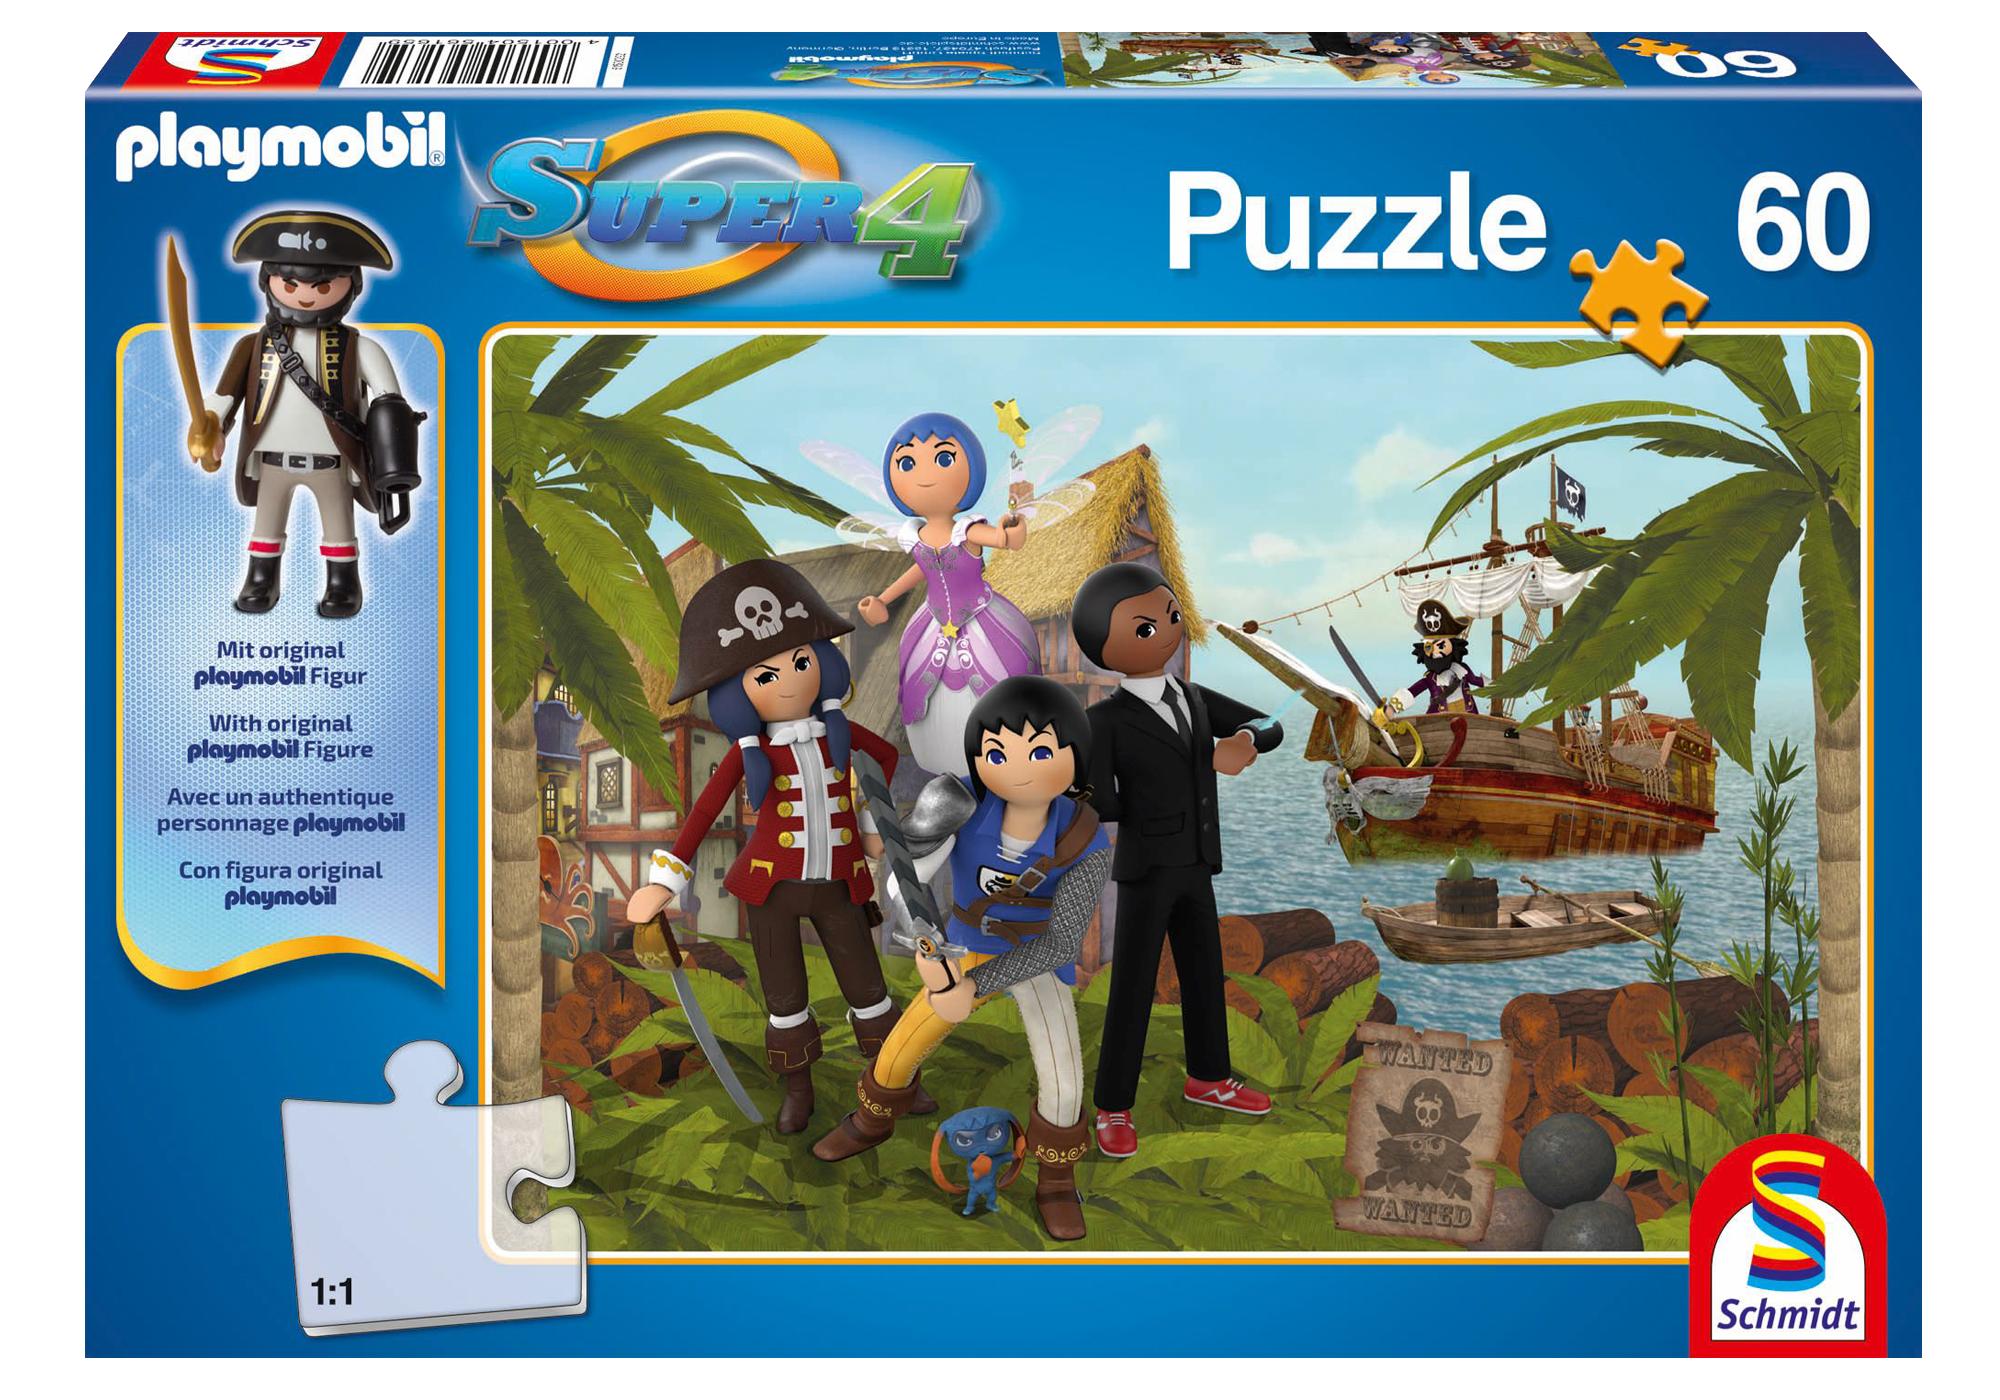 http://media.playmobil.com/i/playmobil/80706_product_detail